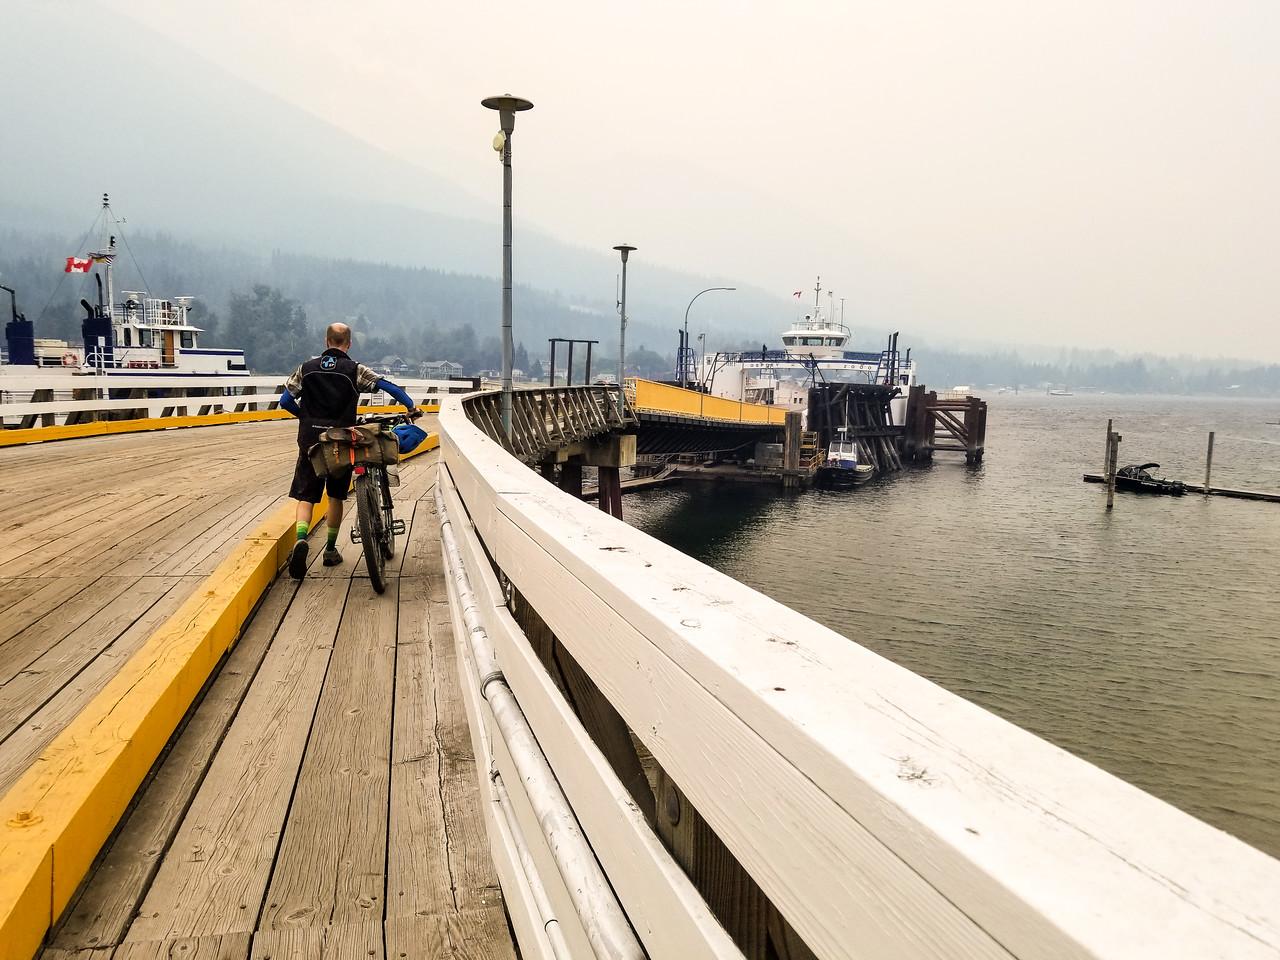 The Balfour ferry, ready to cross Kootenay Lake